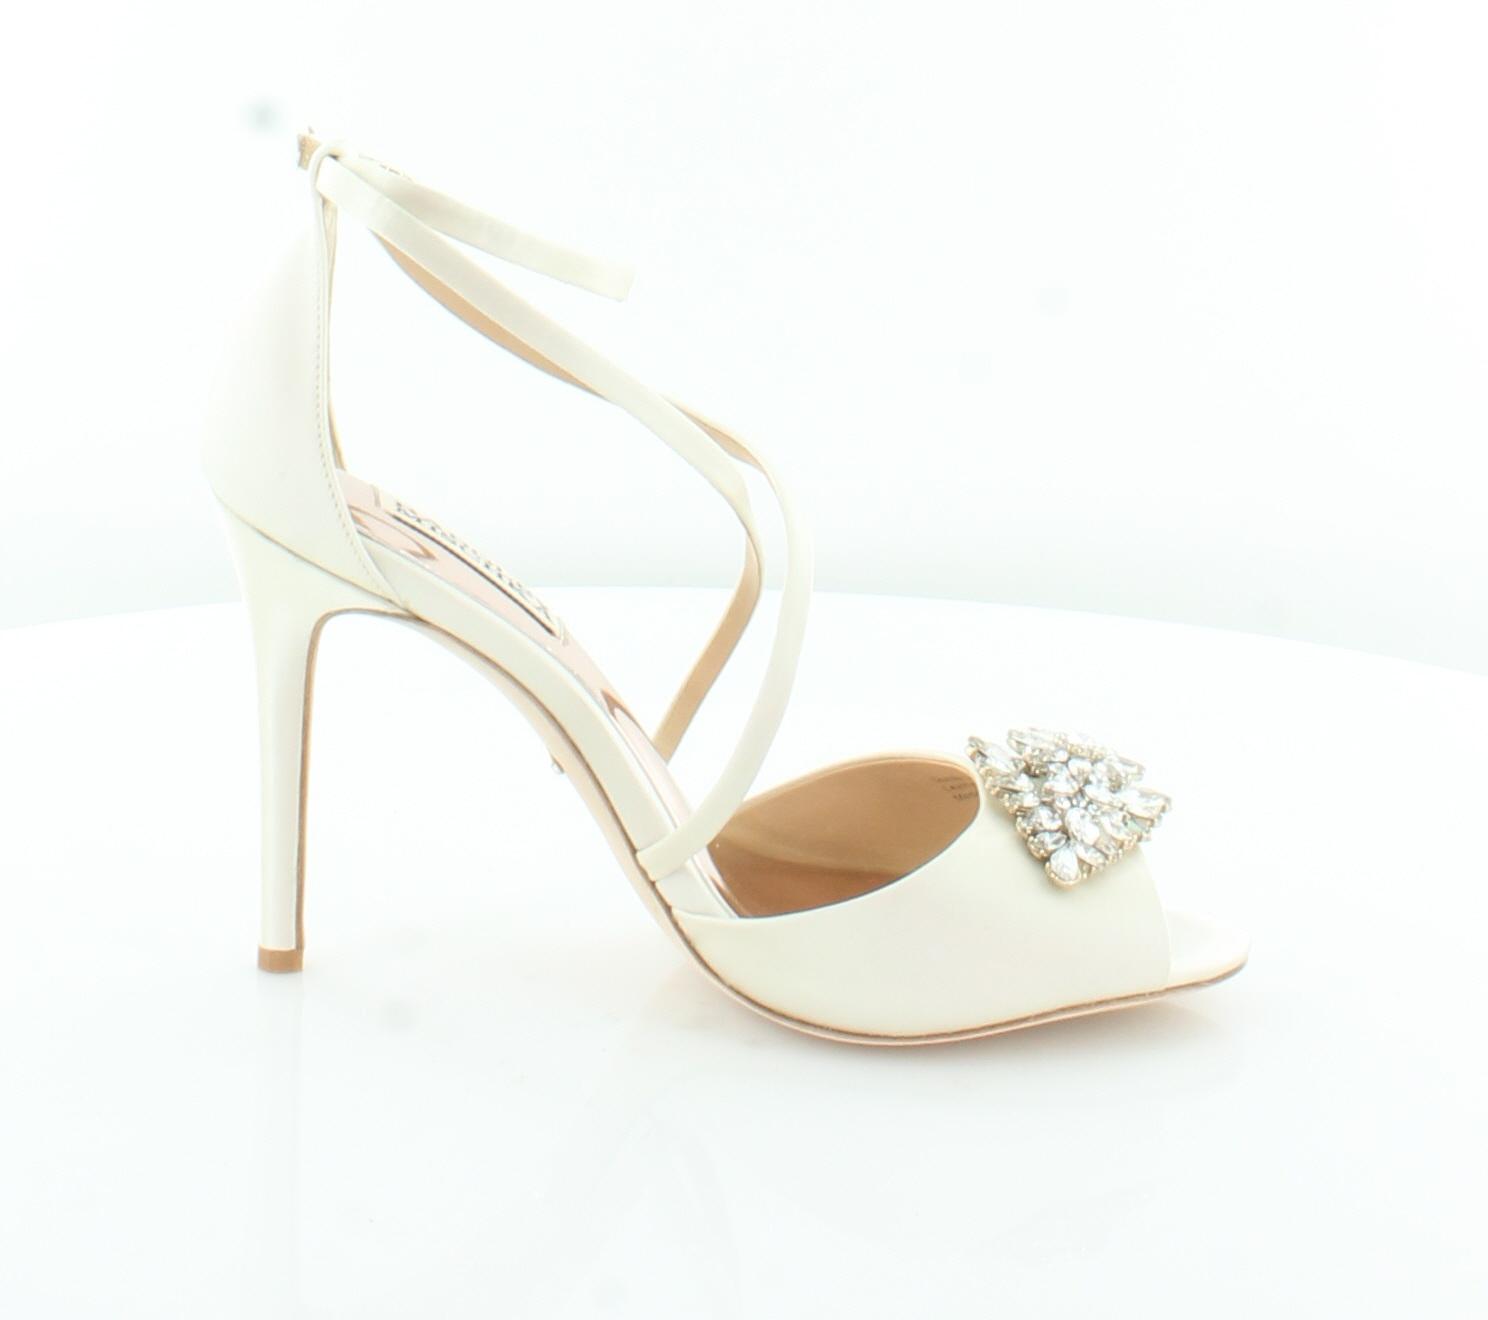 Badgley Mischka Tatum Ivory Donna Shoes Size 7 M Heels MSRP  225